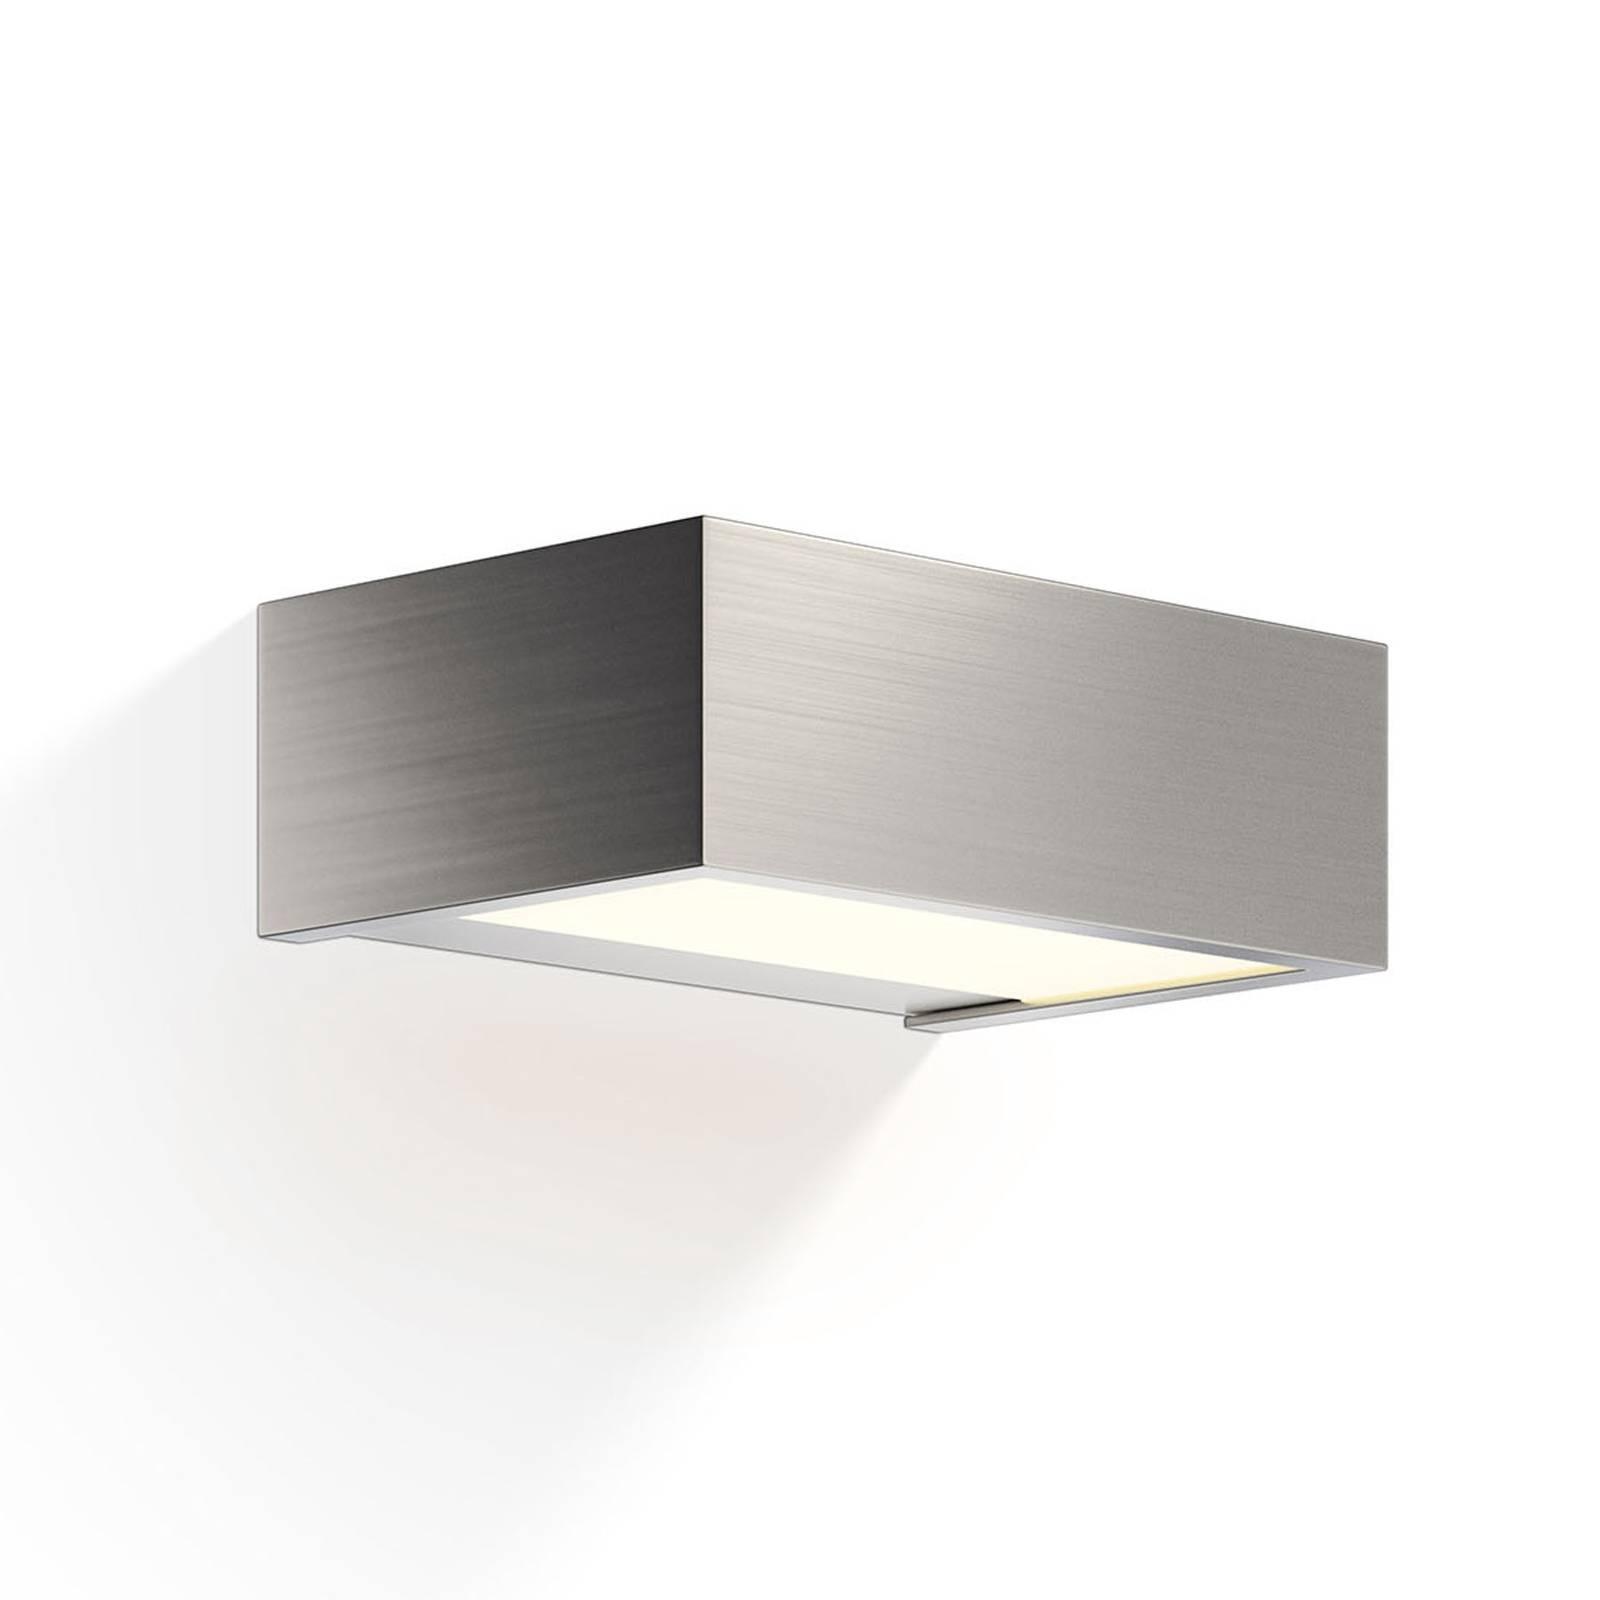 Decor Walther Box LED-seinävalo nikkeli 2700K 15cm